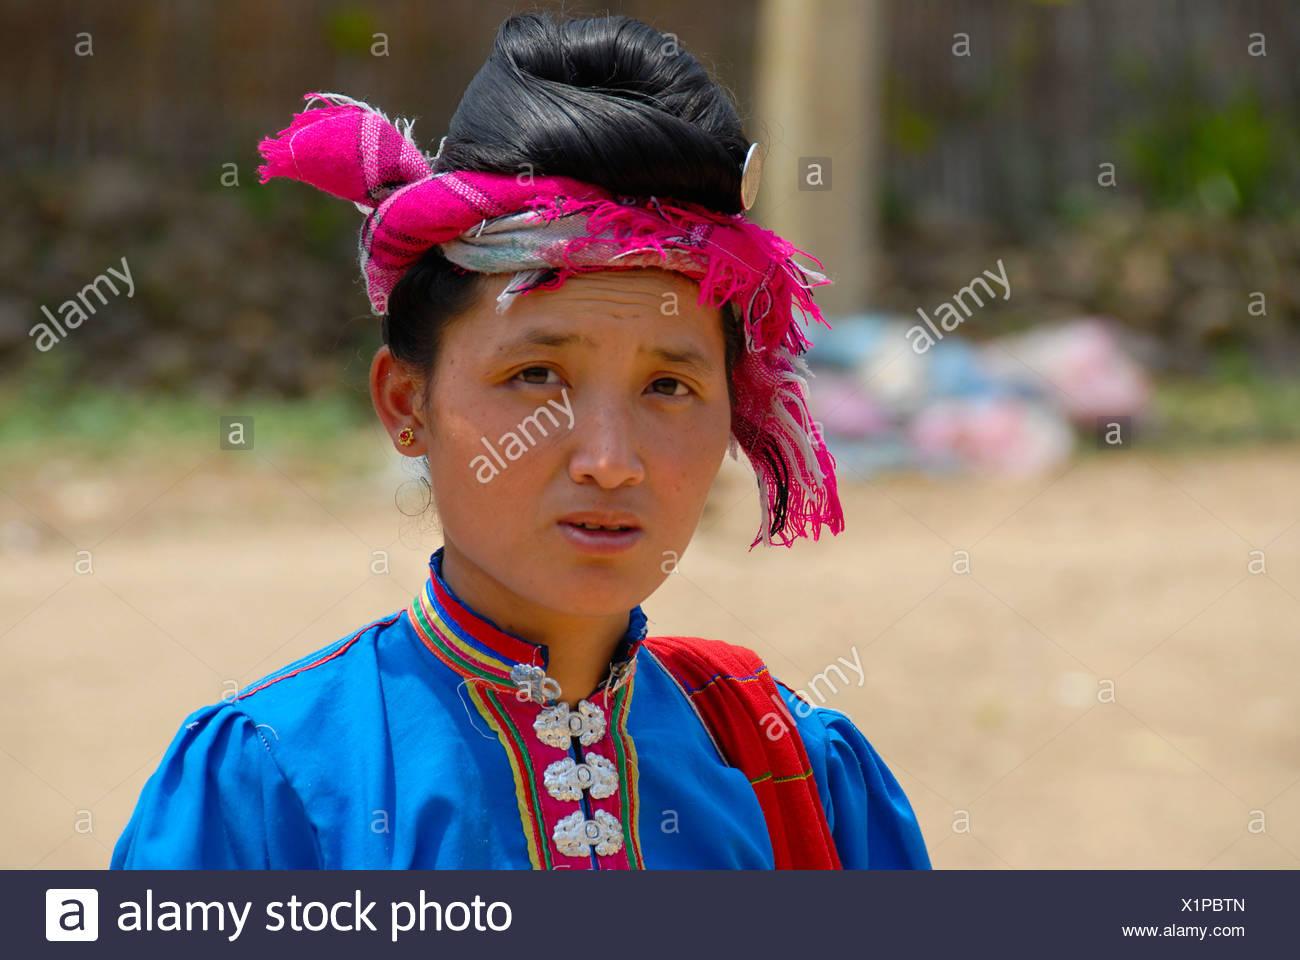 Frau Tai Dam ethnischen Gruppe tragen traditionelle Kleidung, Muang Mai, Provinz Phongsali, Laos, Südostasien Stockbild